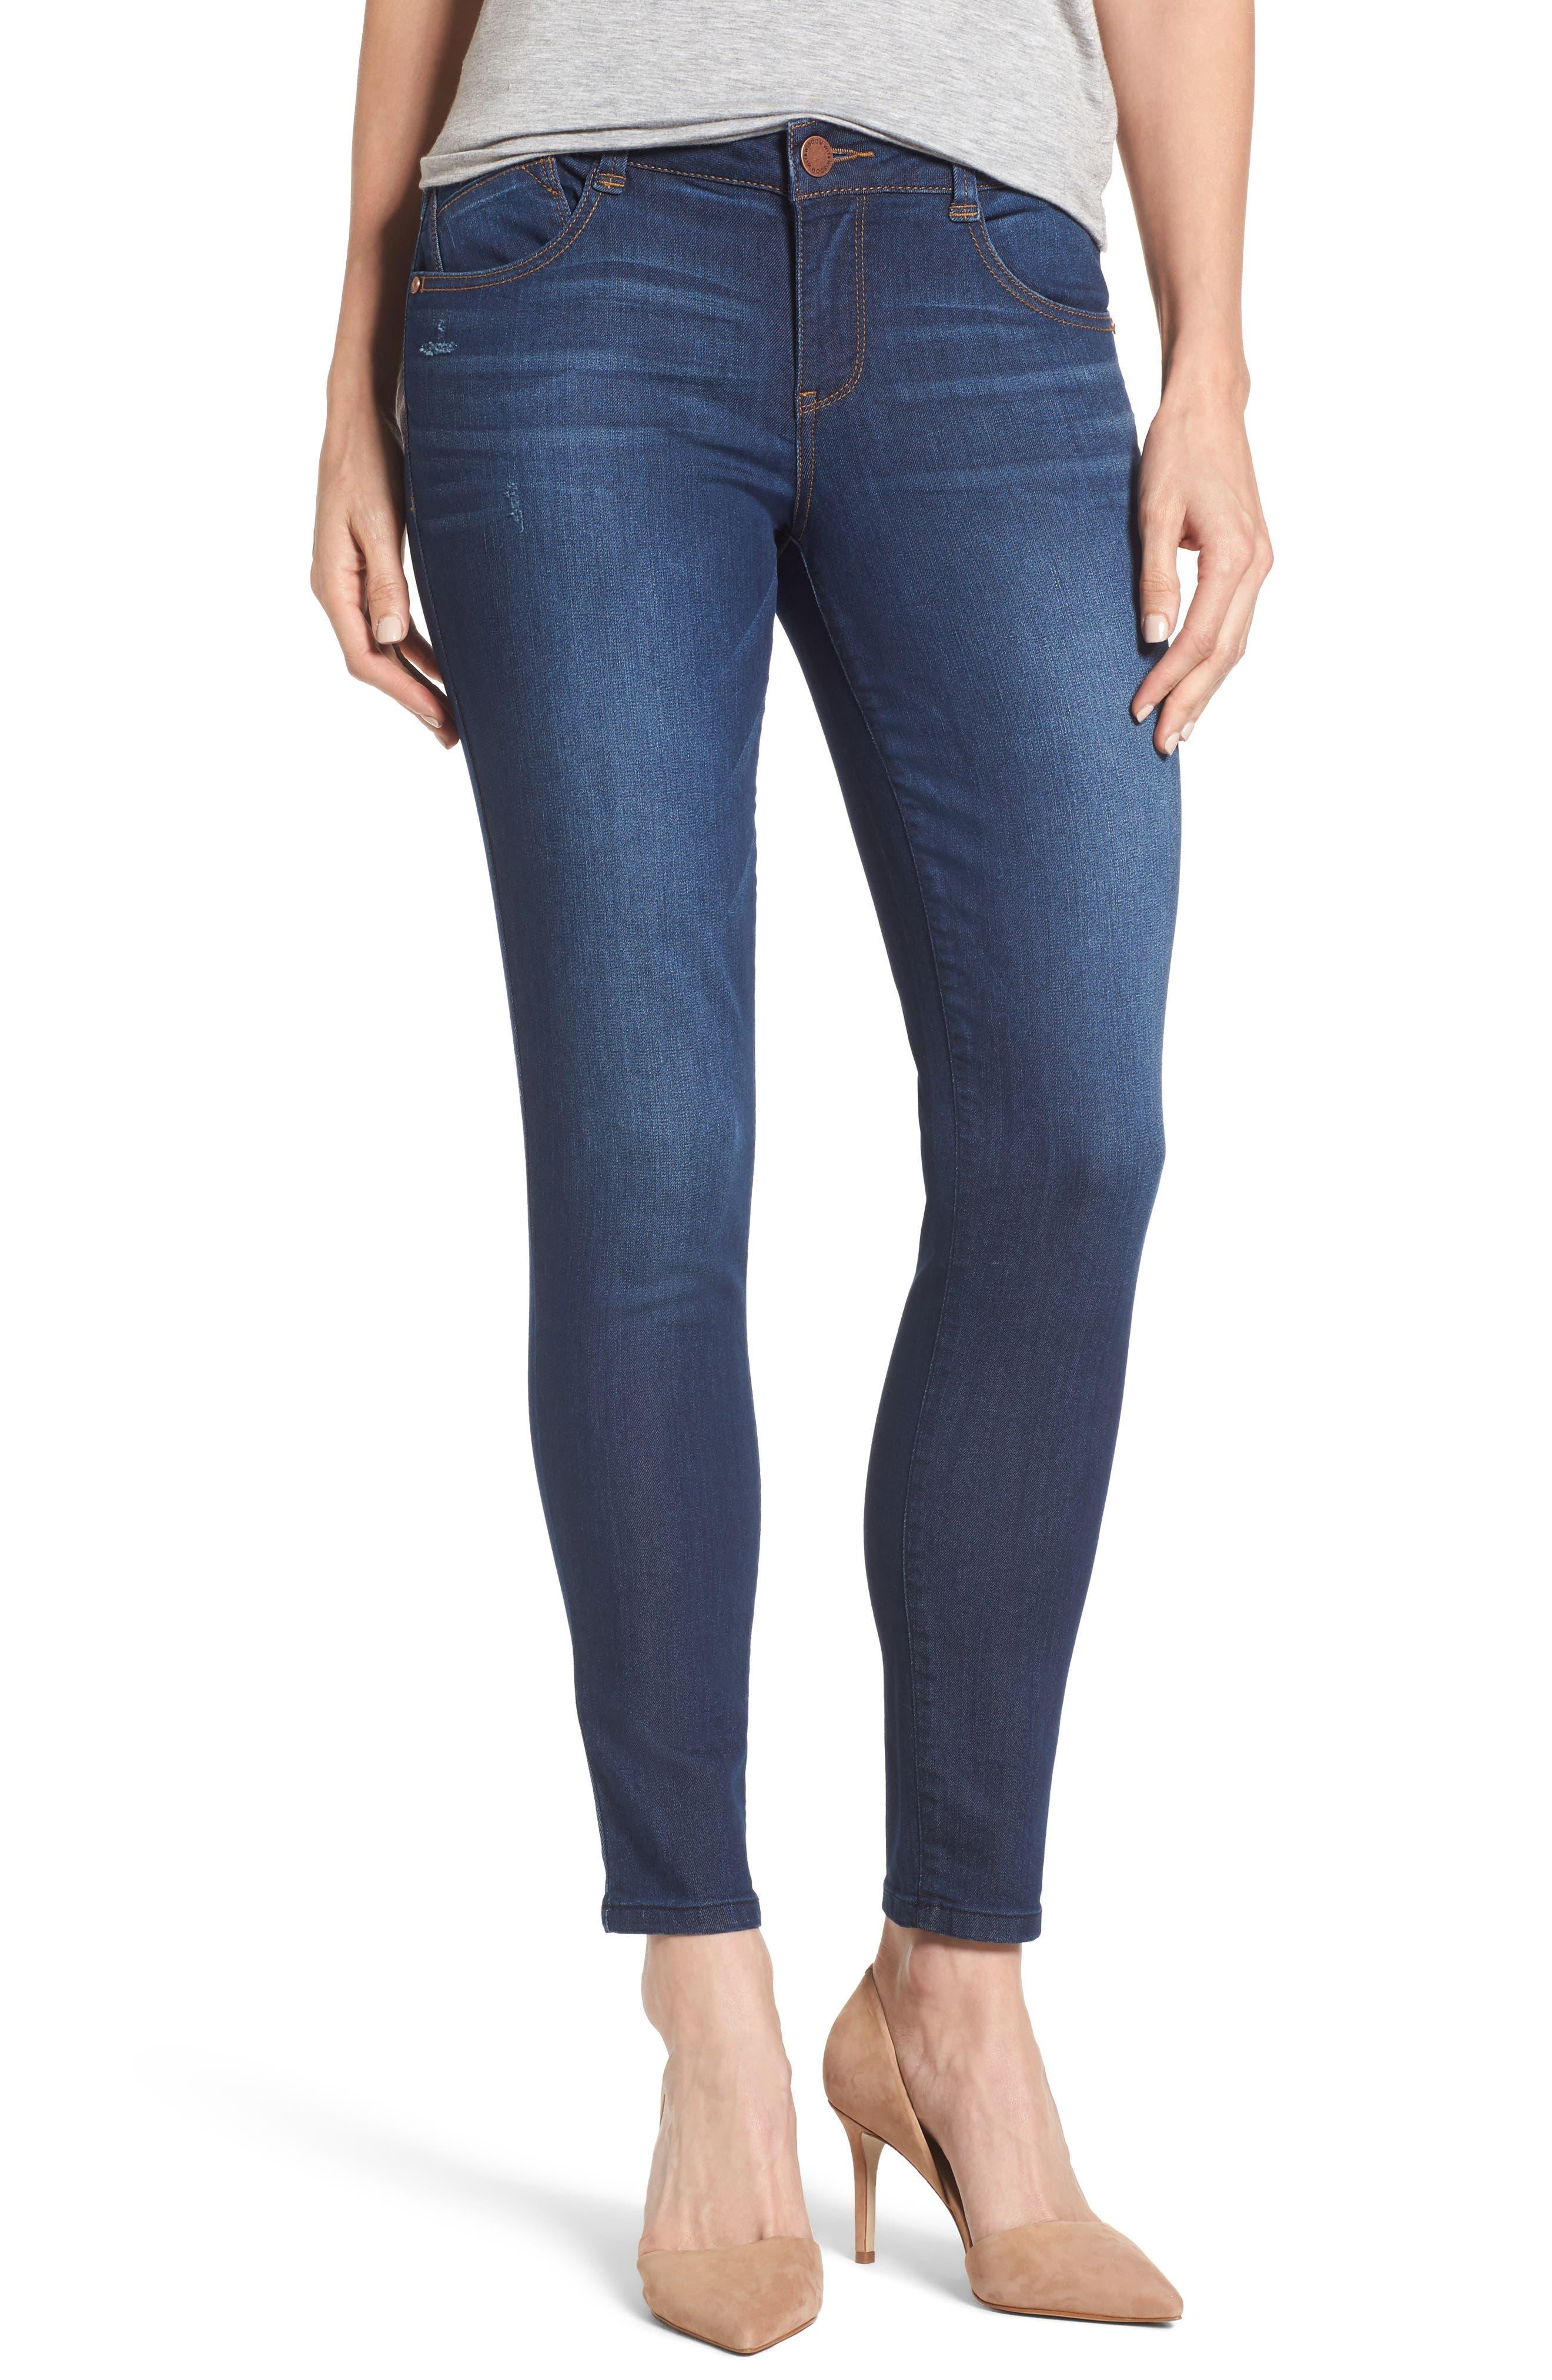 Wit & Wisdom Skinny Ankle Jeans (Nordstrom Exclusive) (Regular & Petite)